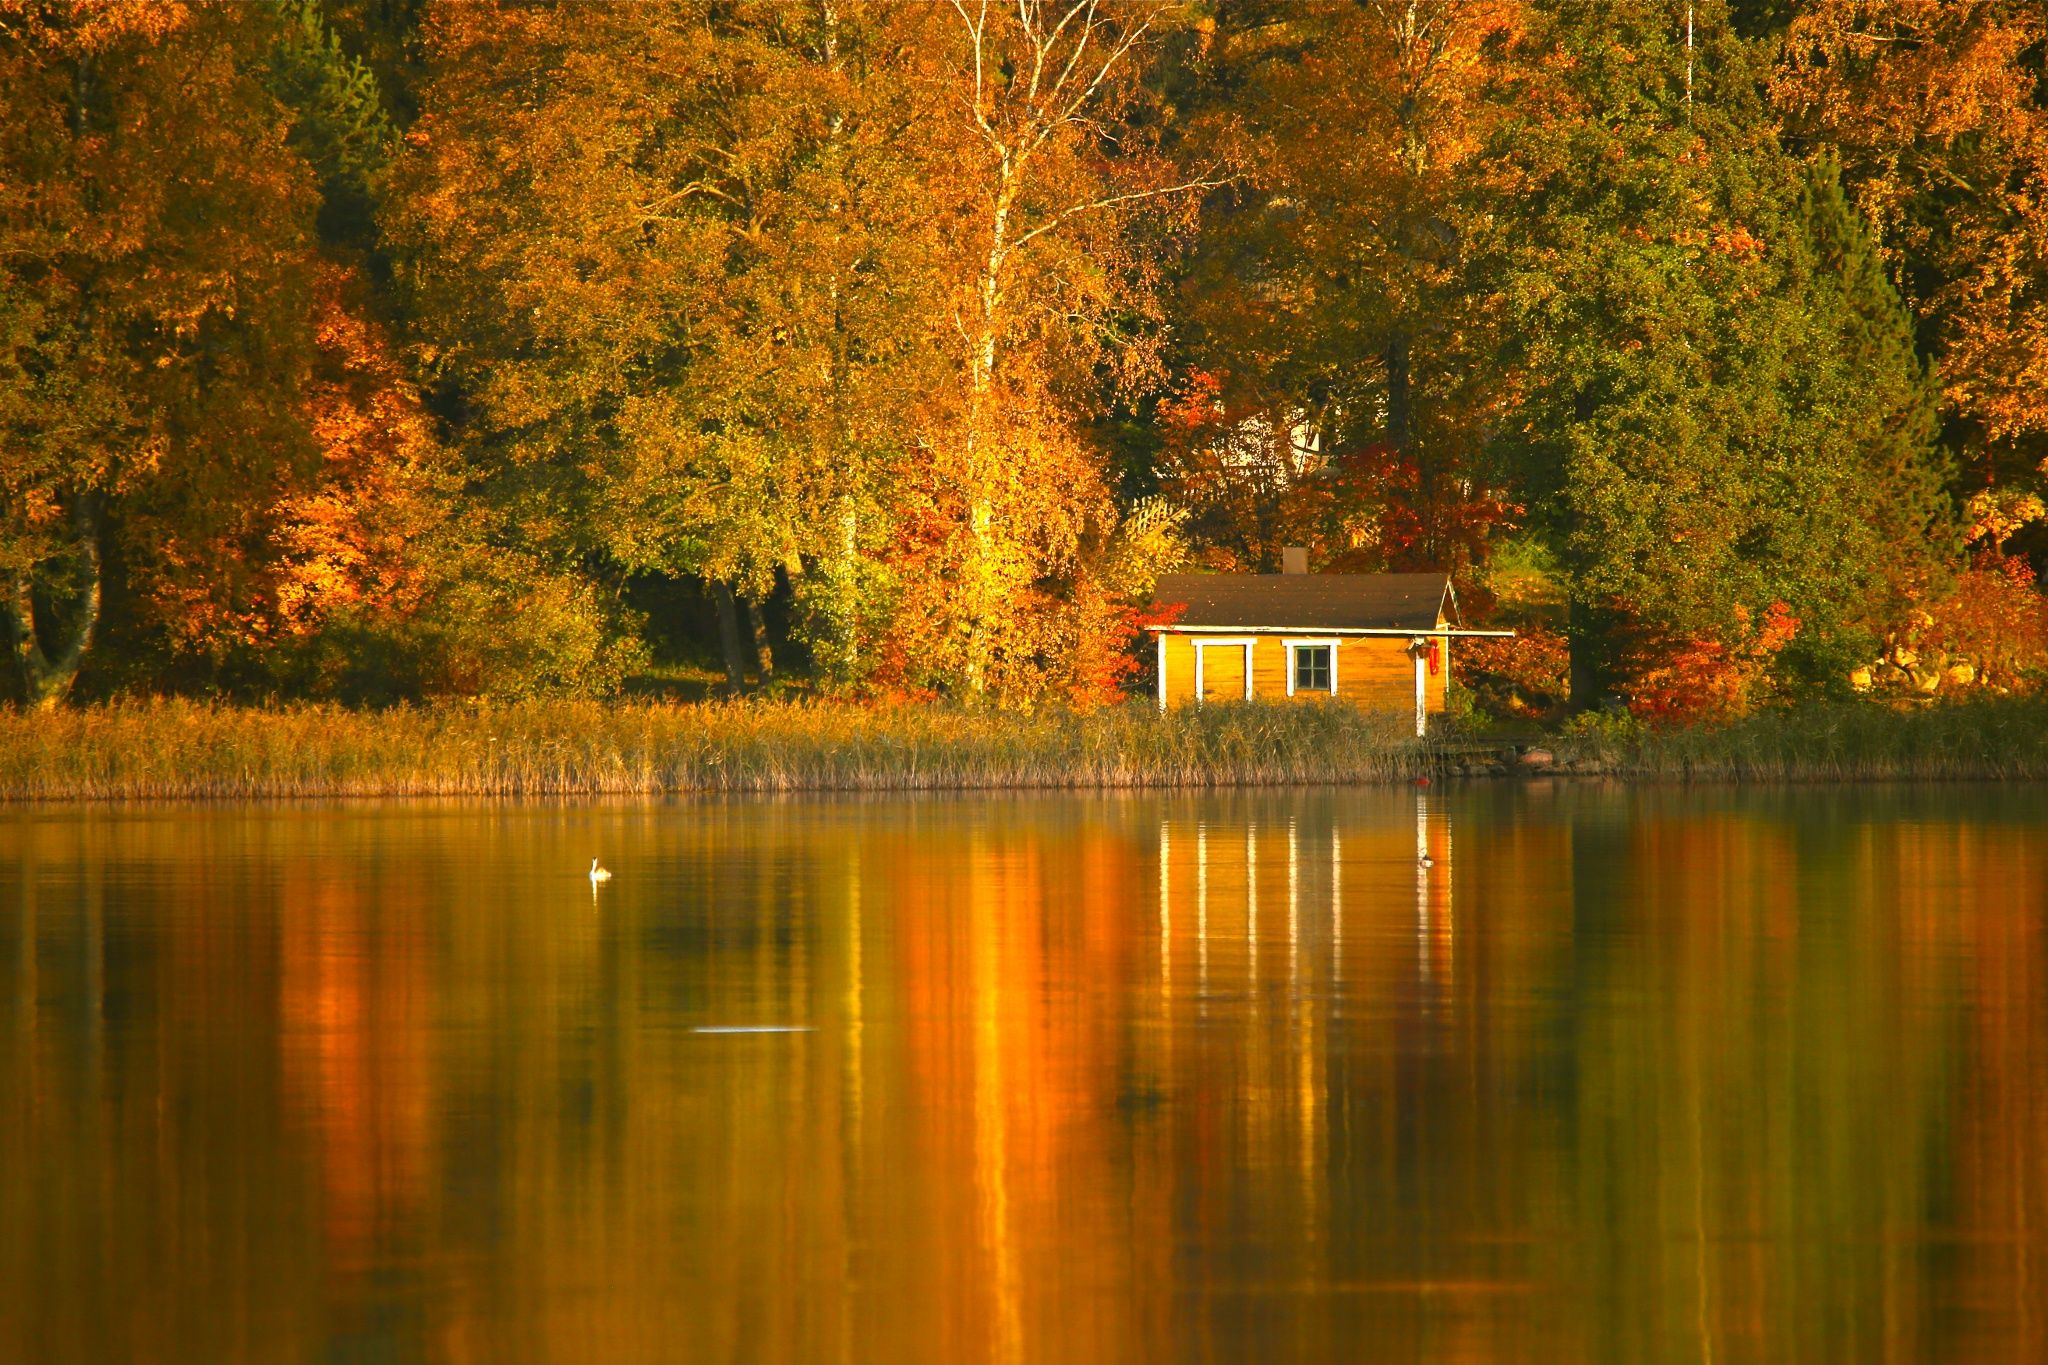 Photograph Autumn reflections by Päivi Vikström on 500px